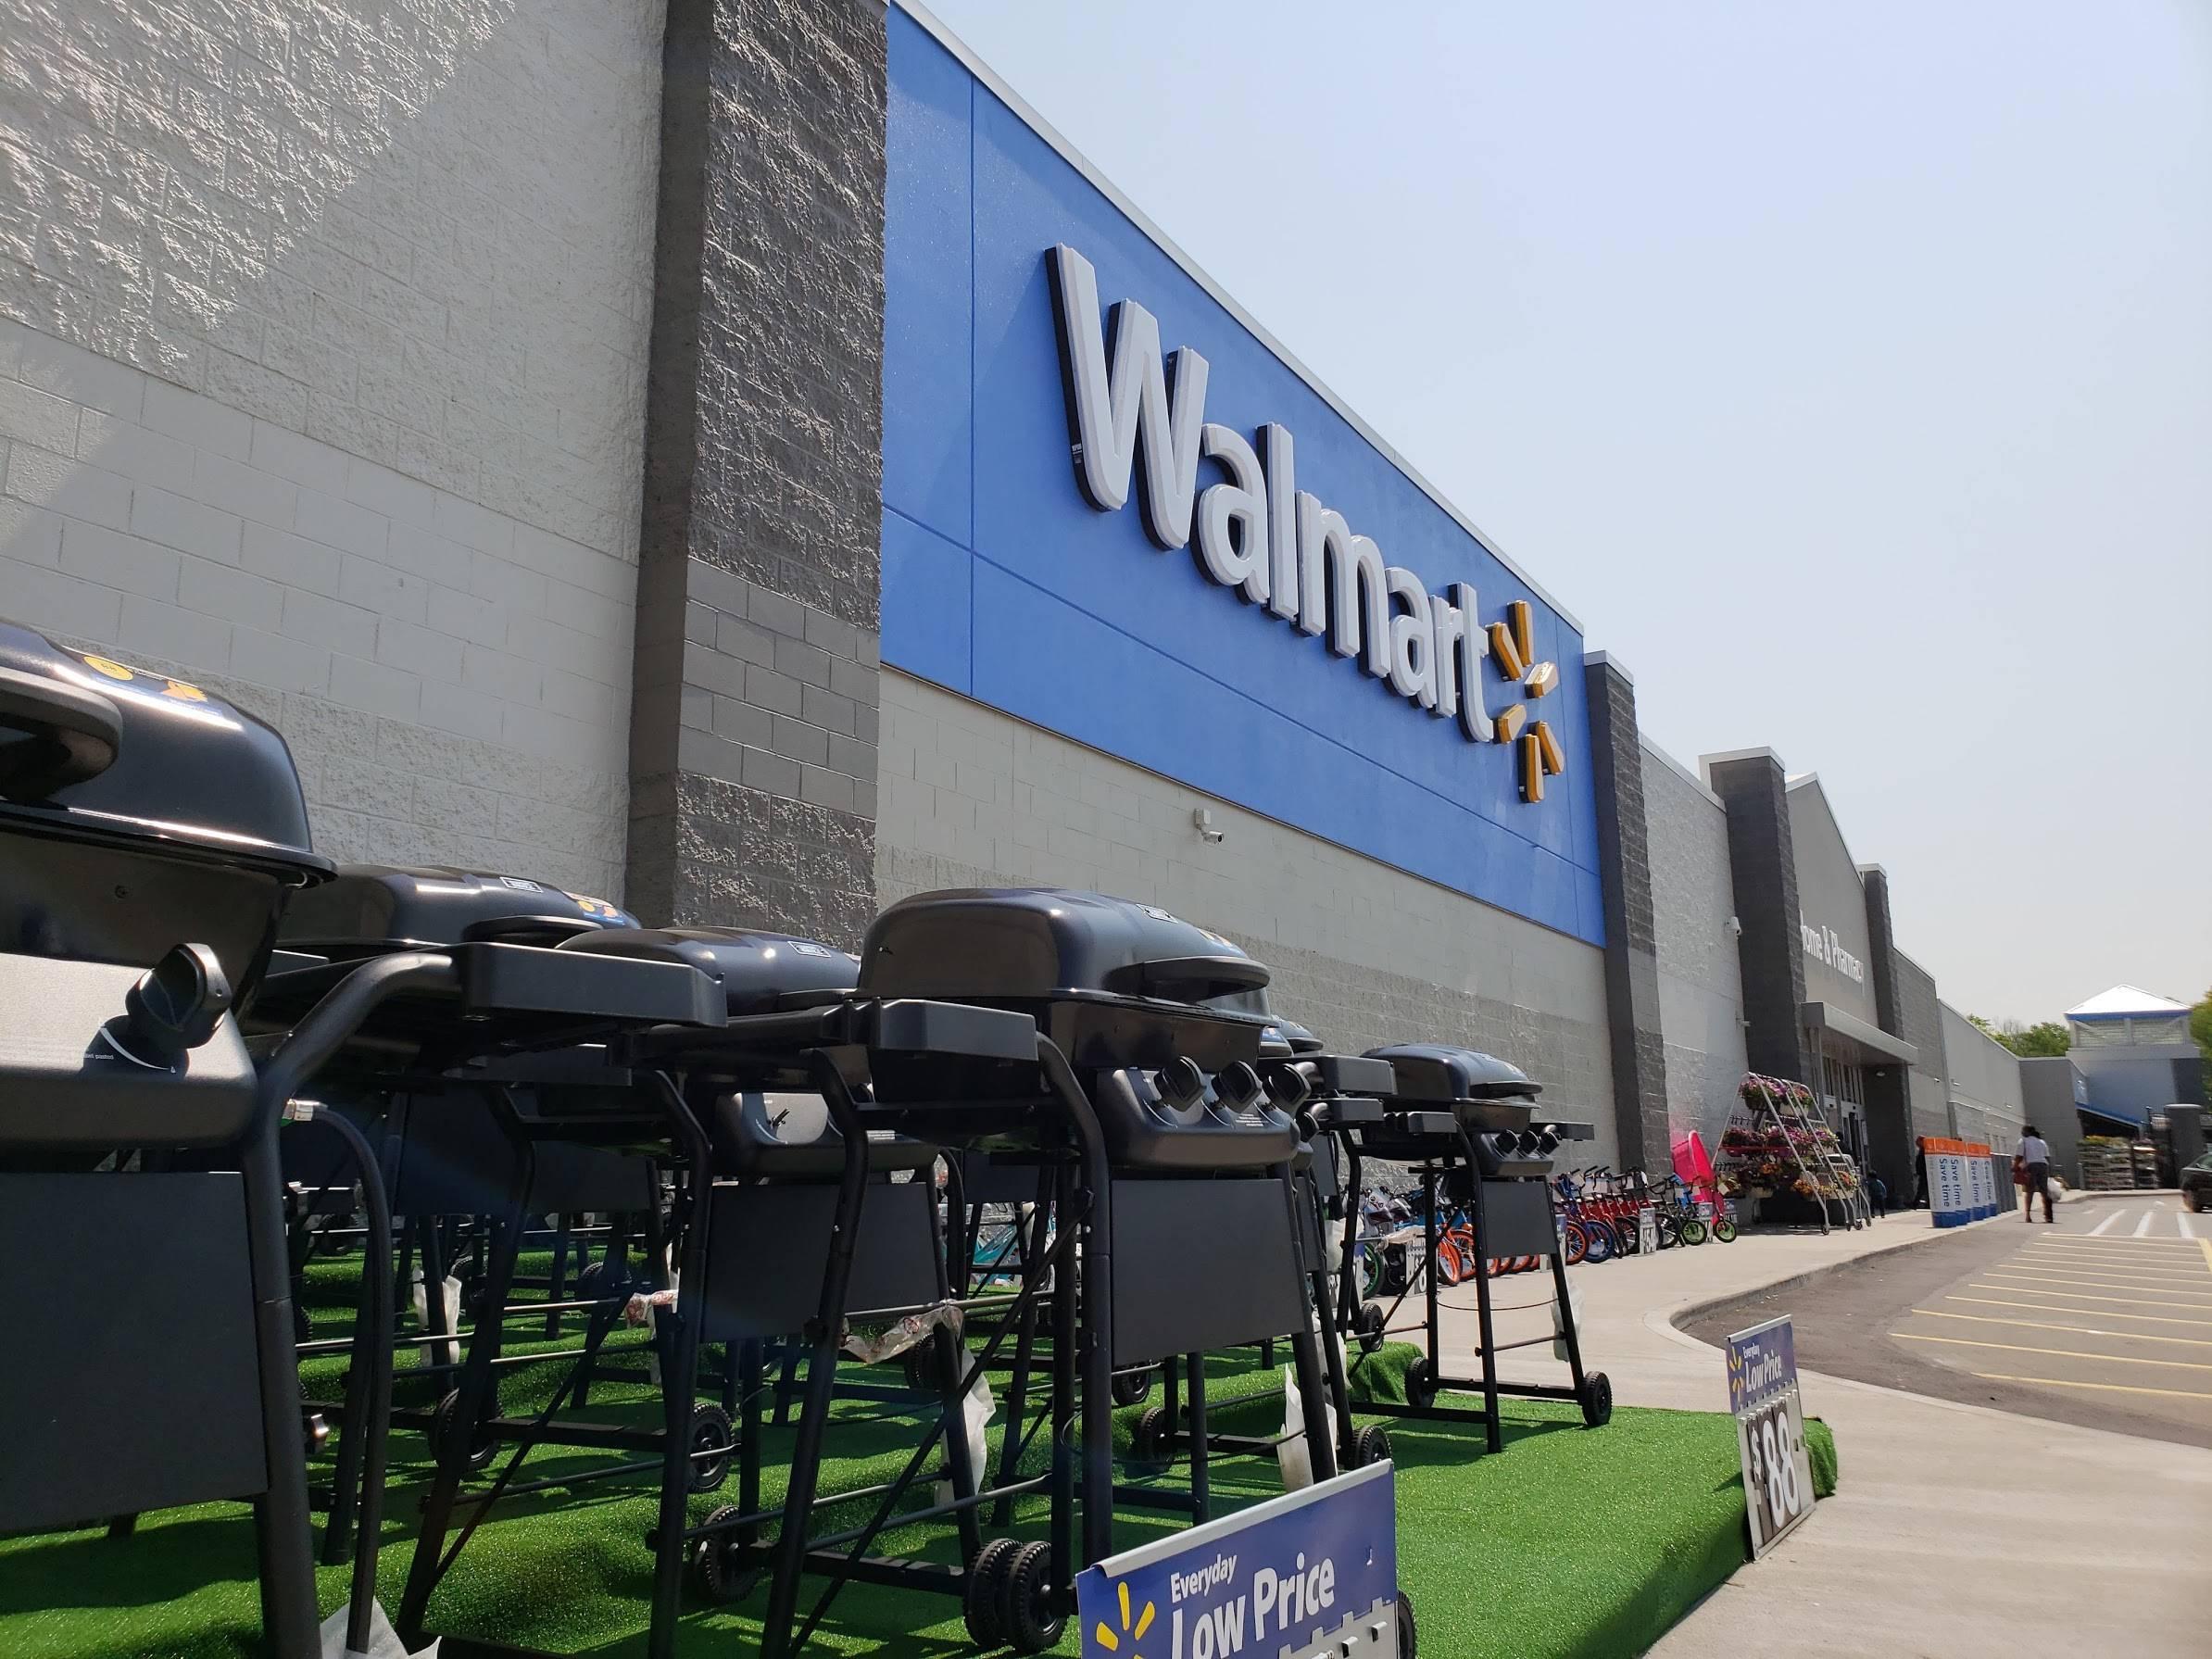 6ff2631ceede1f840929_Walmart1.jpg